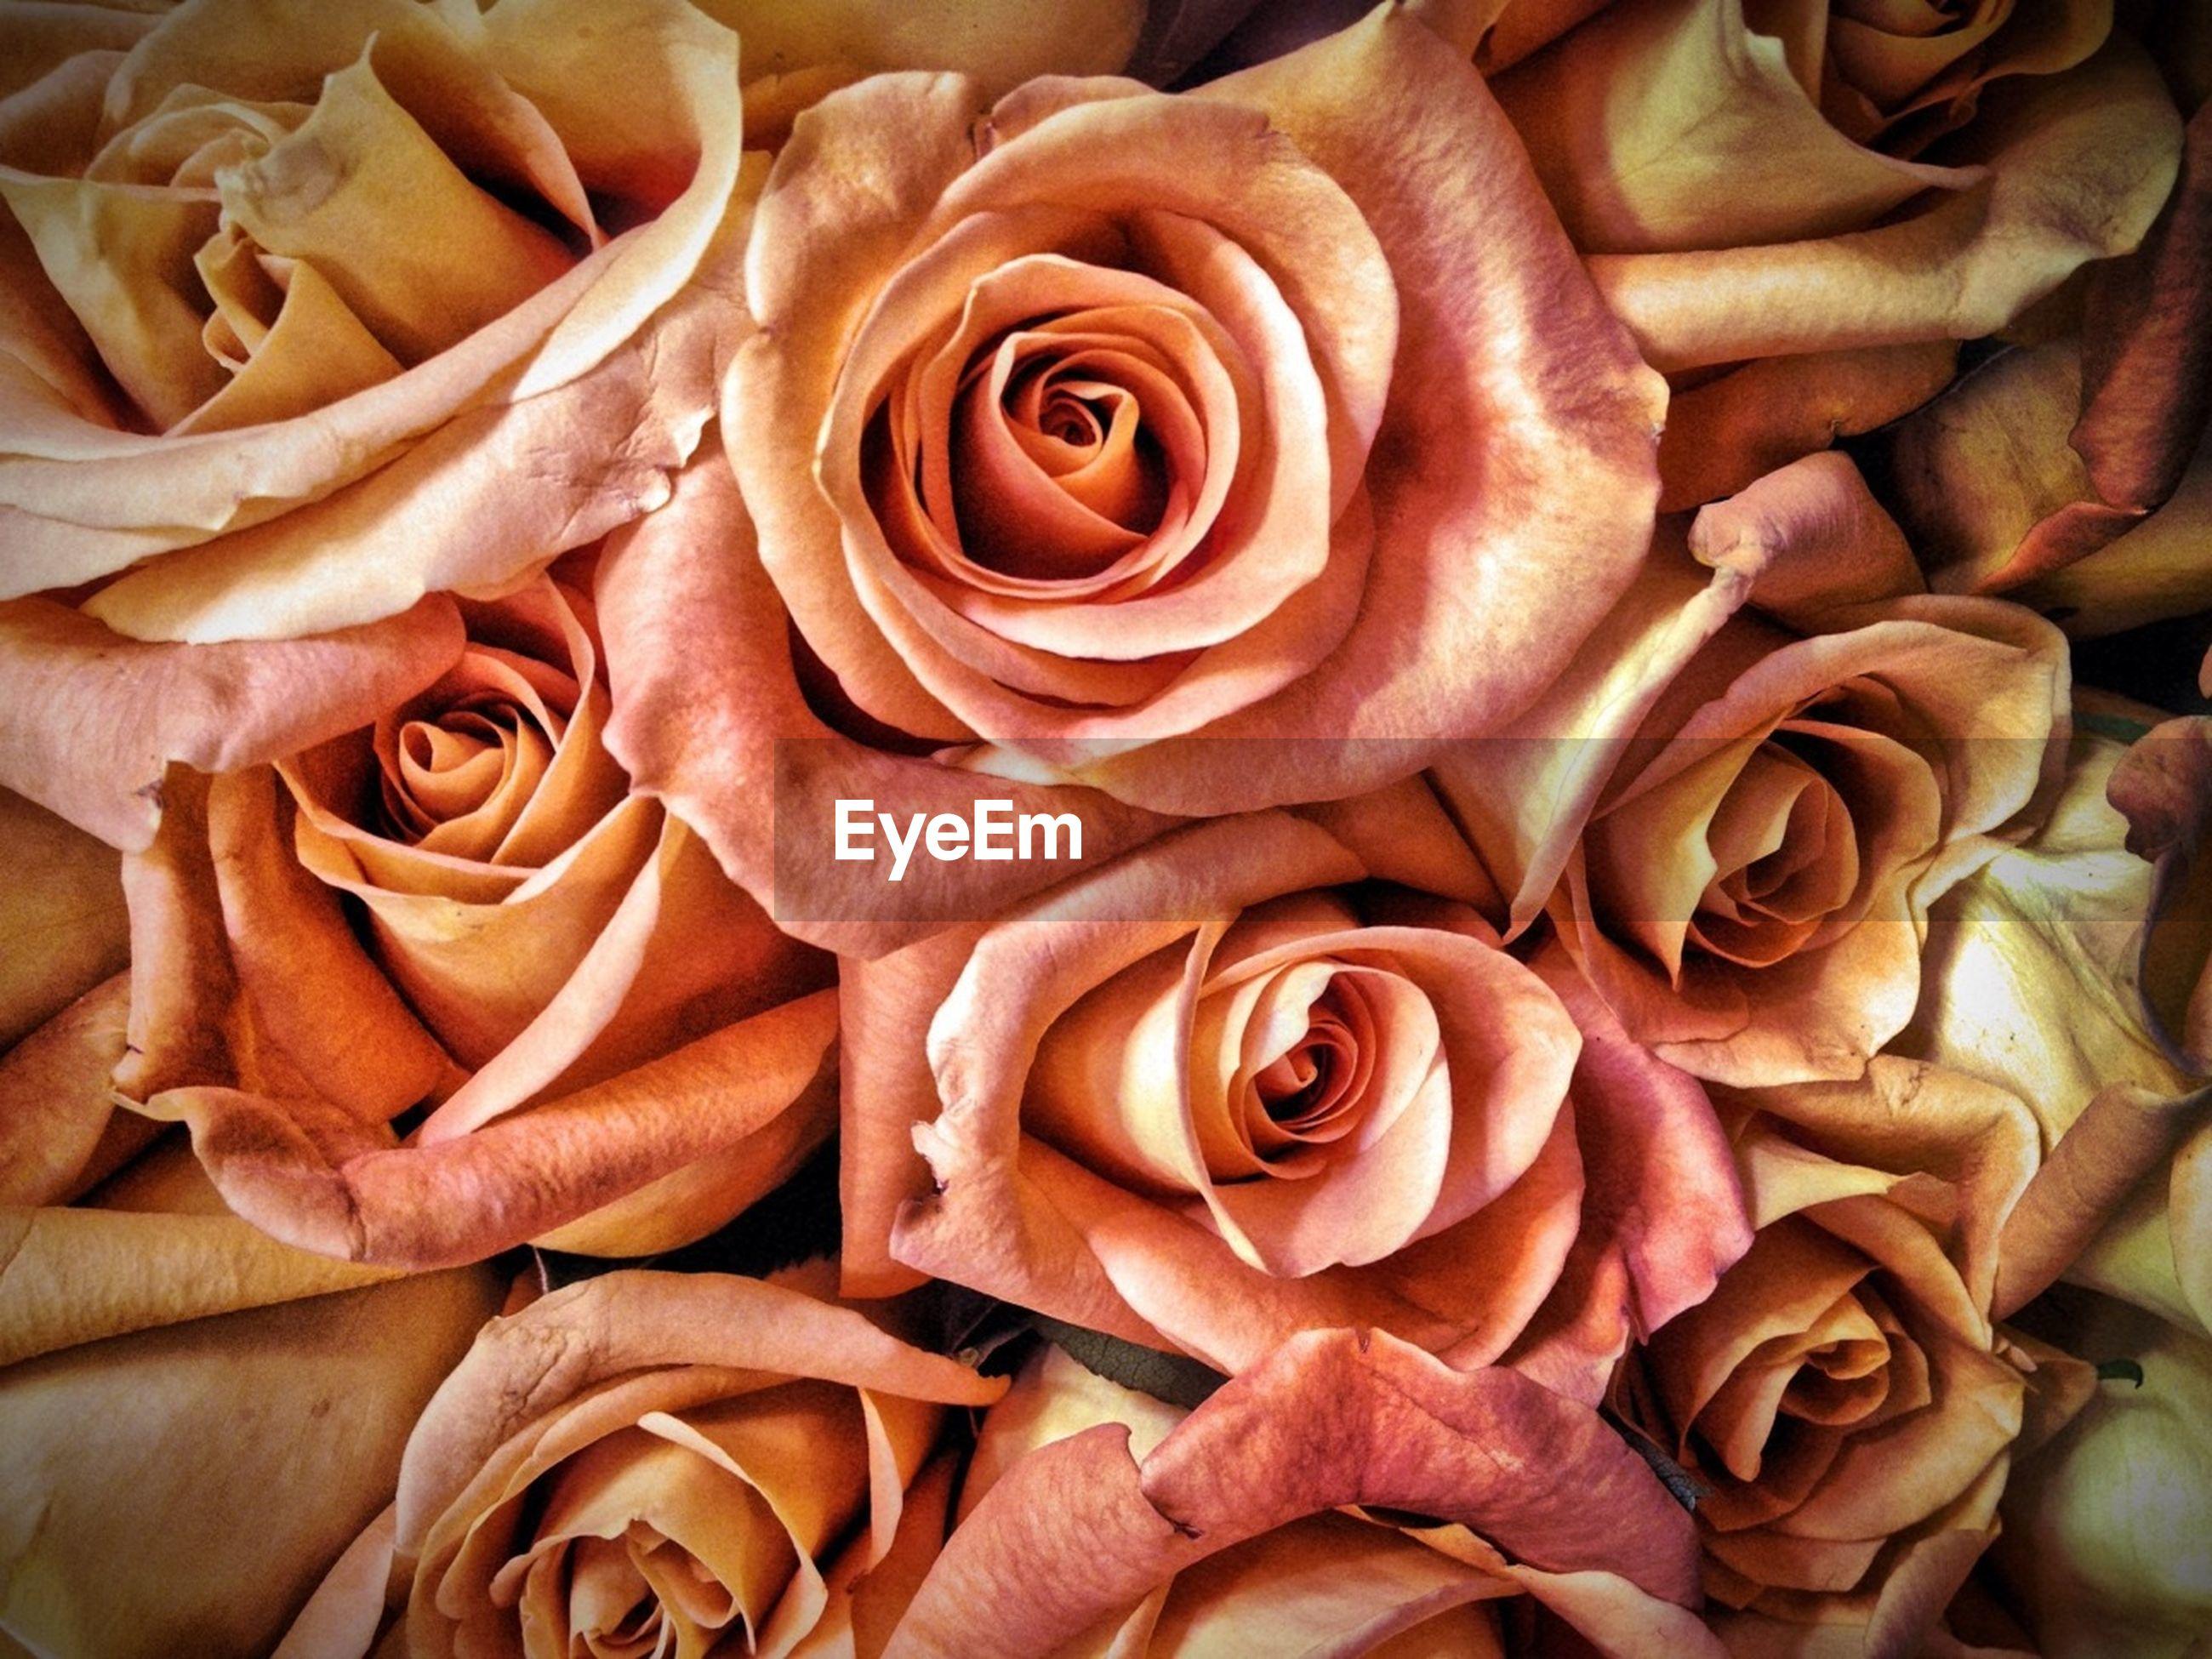 Detail shot of roses